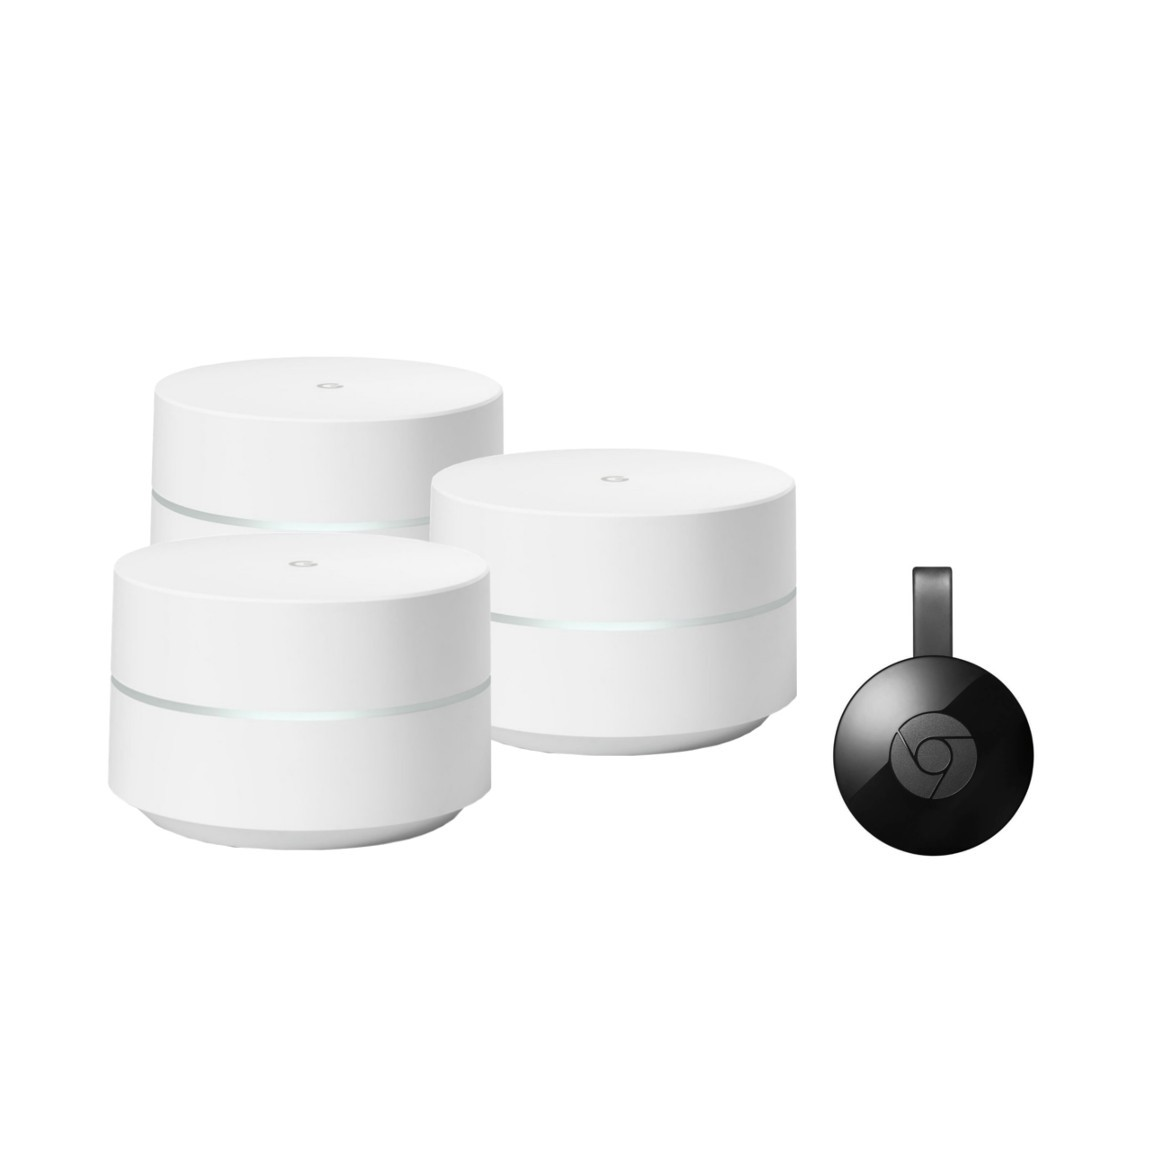 Google Wifi (Dreierpack) + Google Chromecast